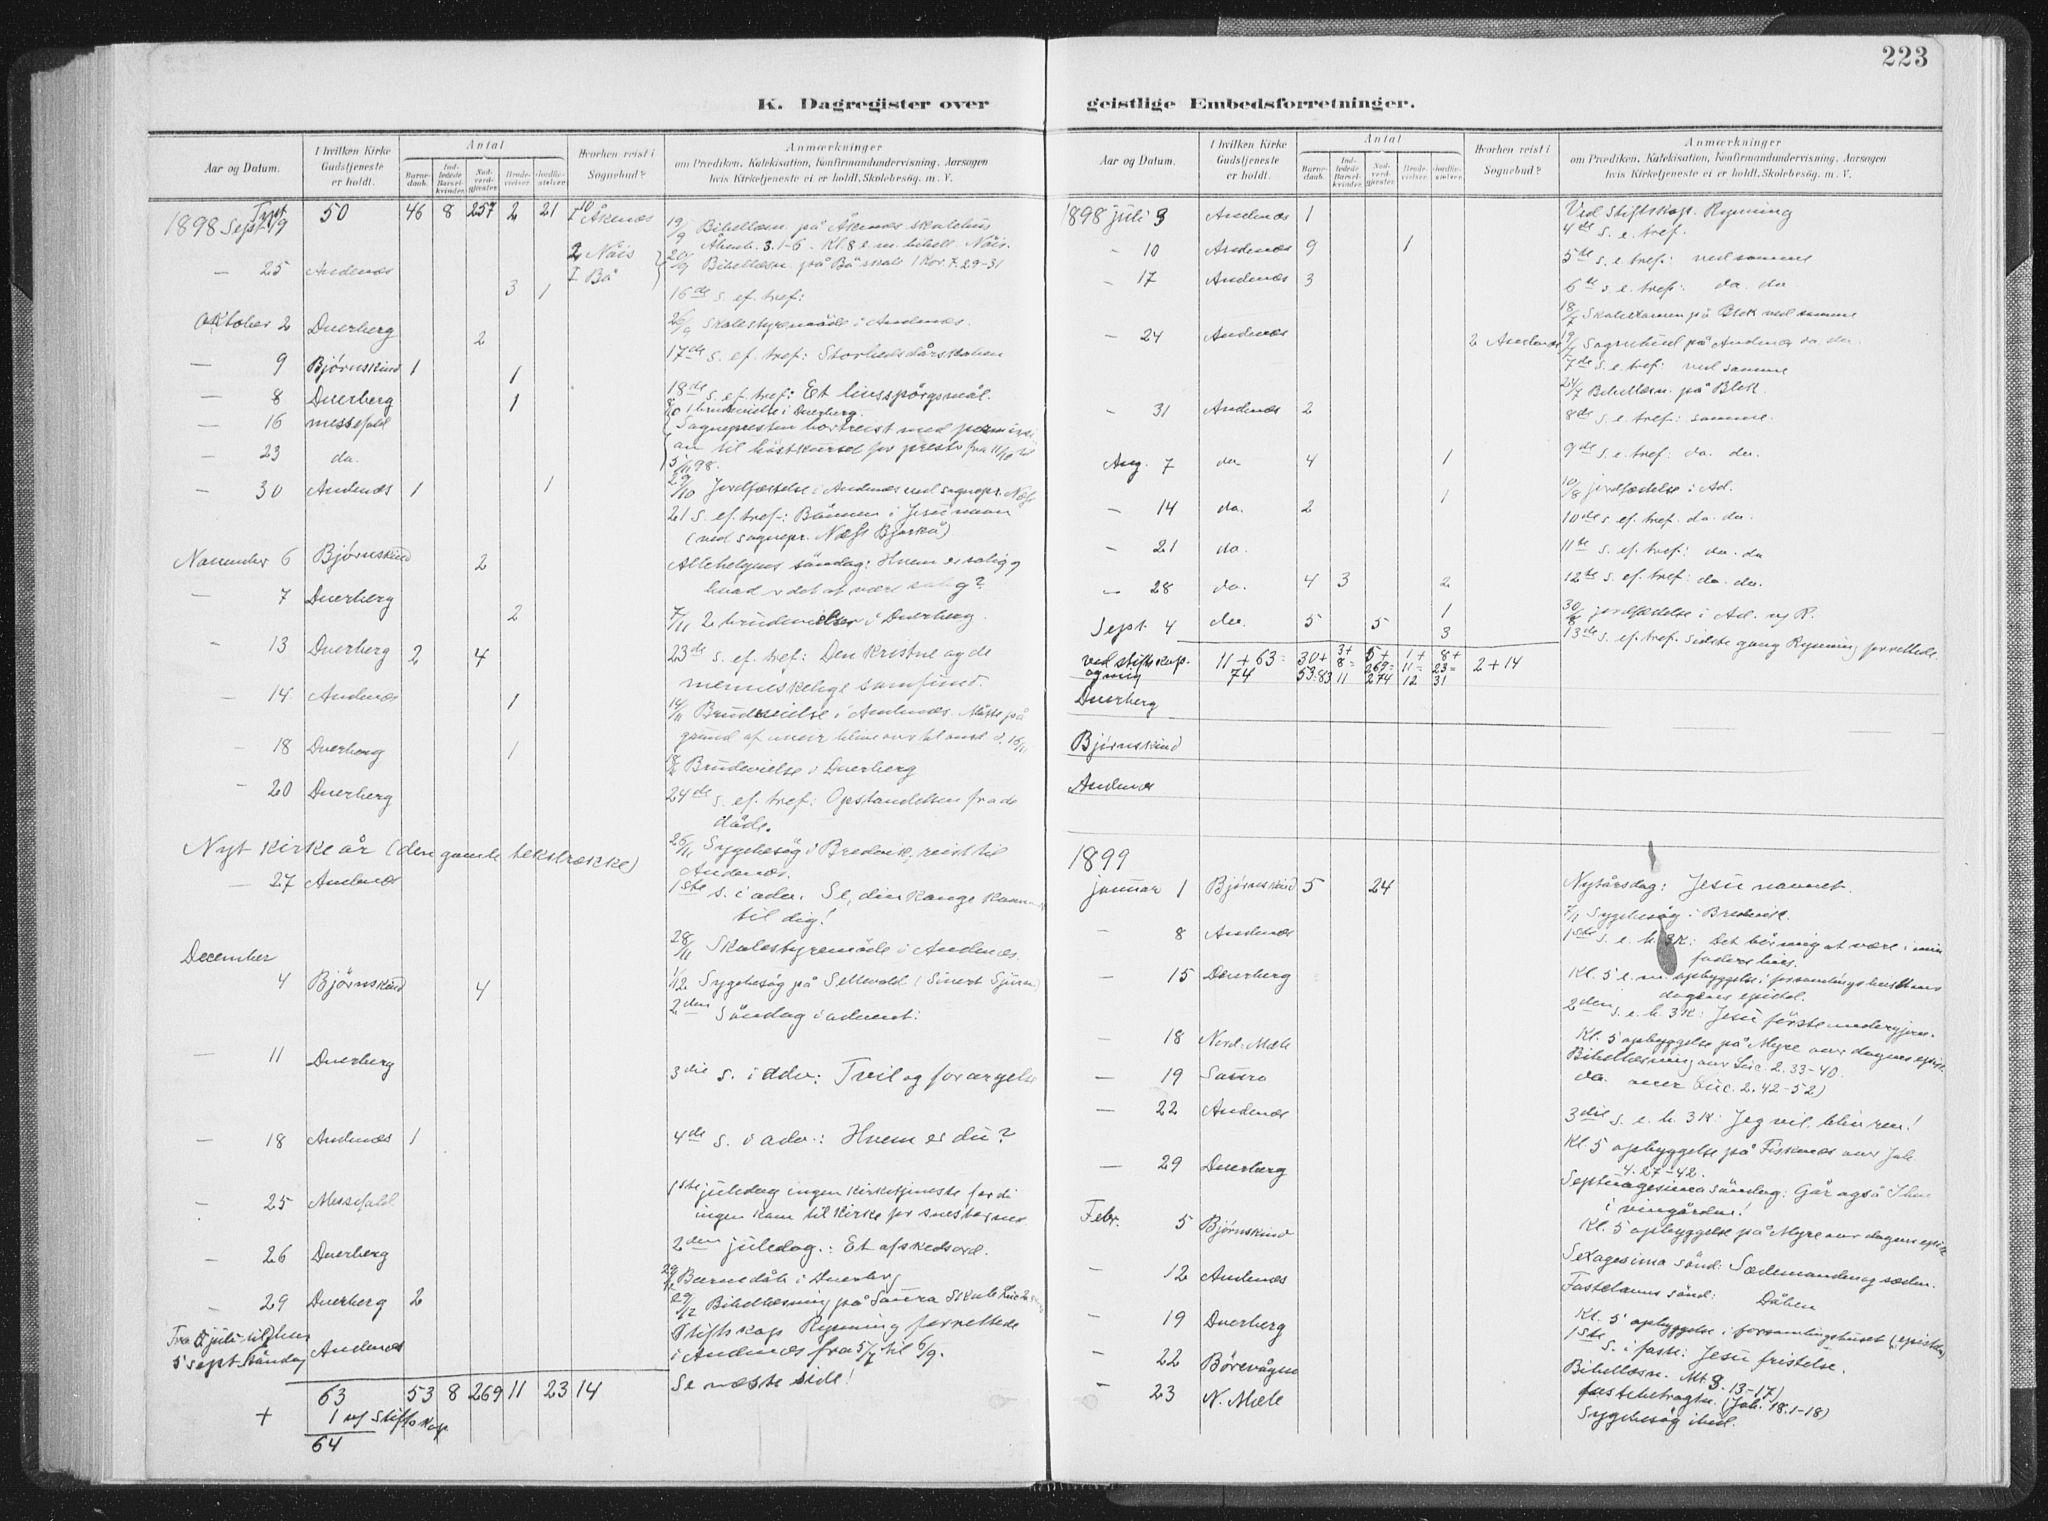 SAT, Ministerialprotokoller, klokkerbøker og fødselsregistre - Nordland, 897/L1400: Ministerialbok nr. 897A07, 1897-1908, s. 223